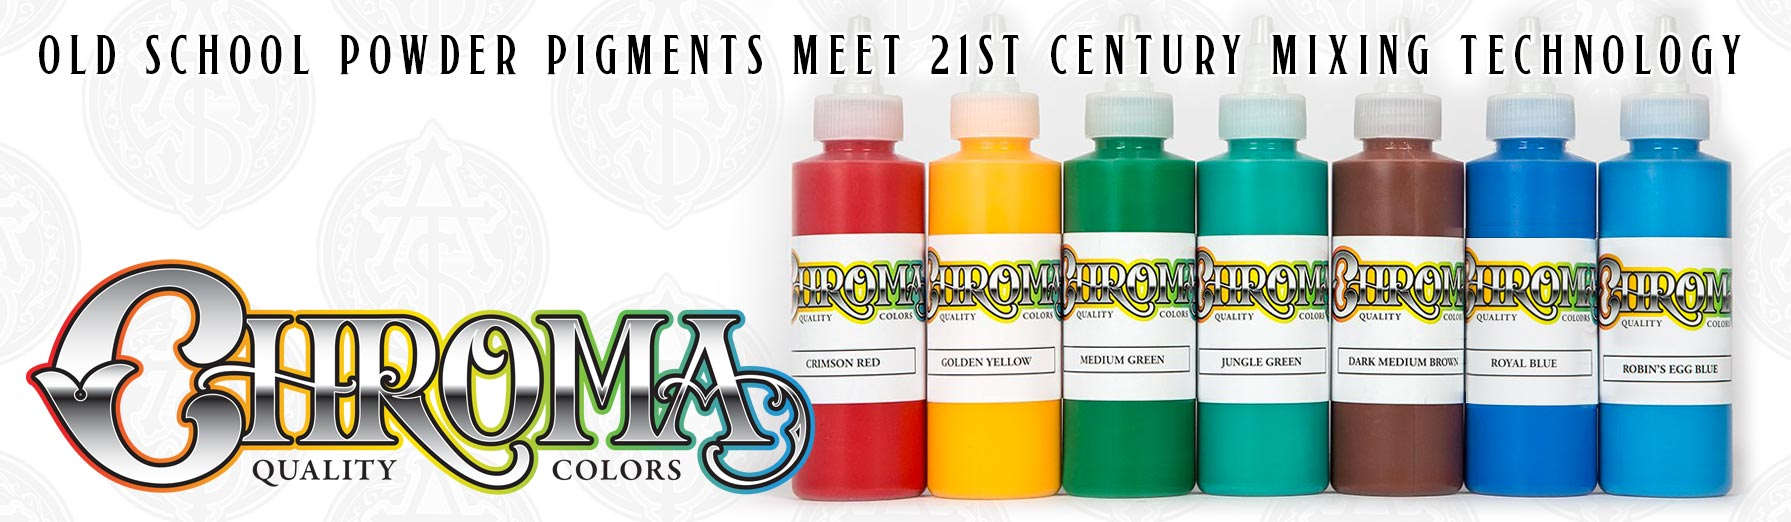 Chroma Colors - Alliance Tattoo Supply